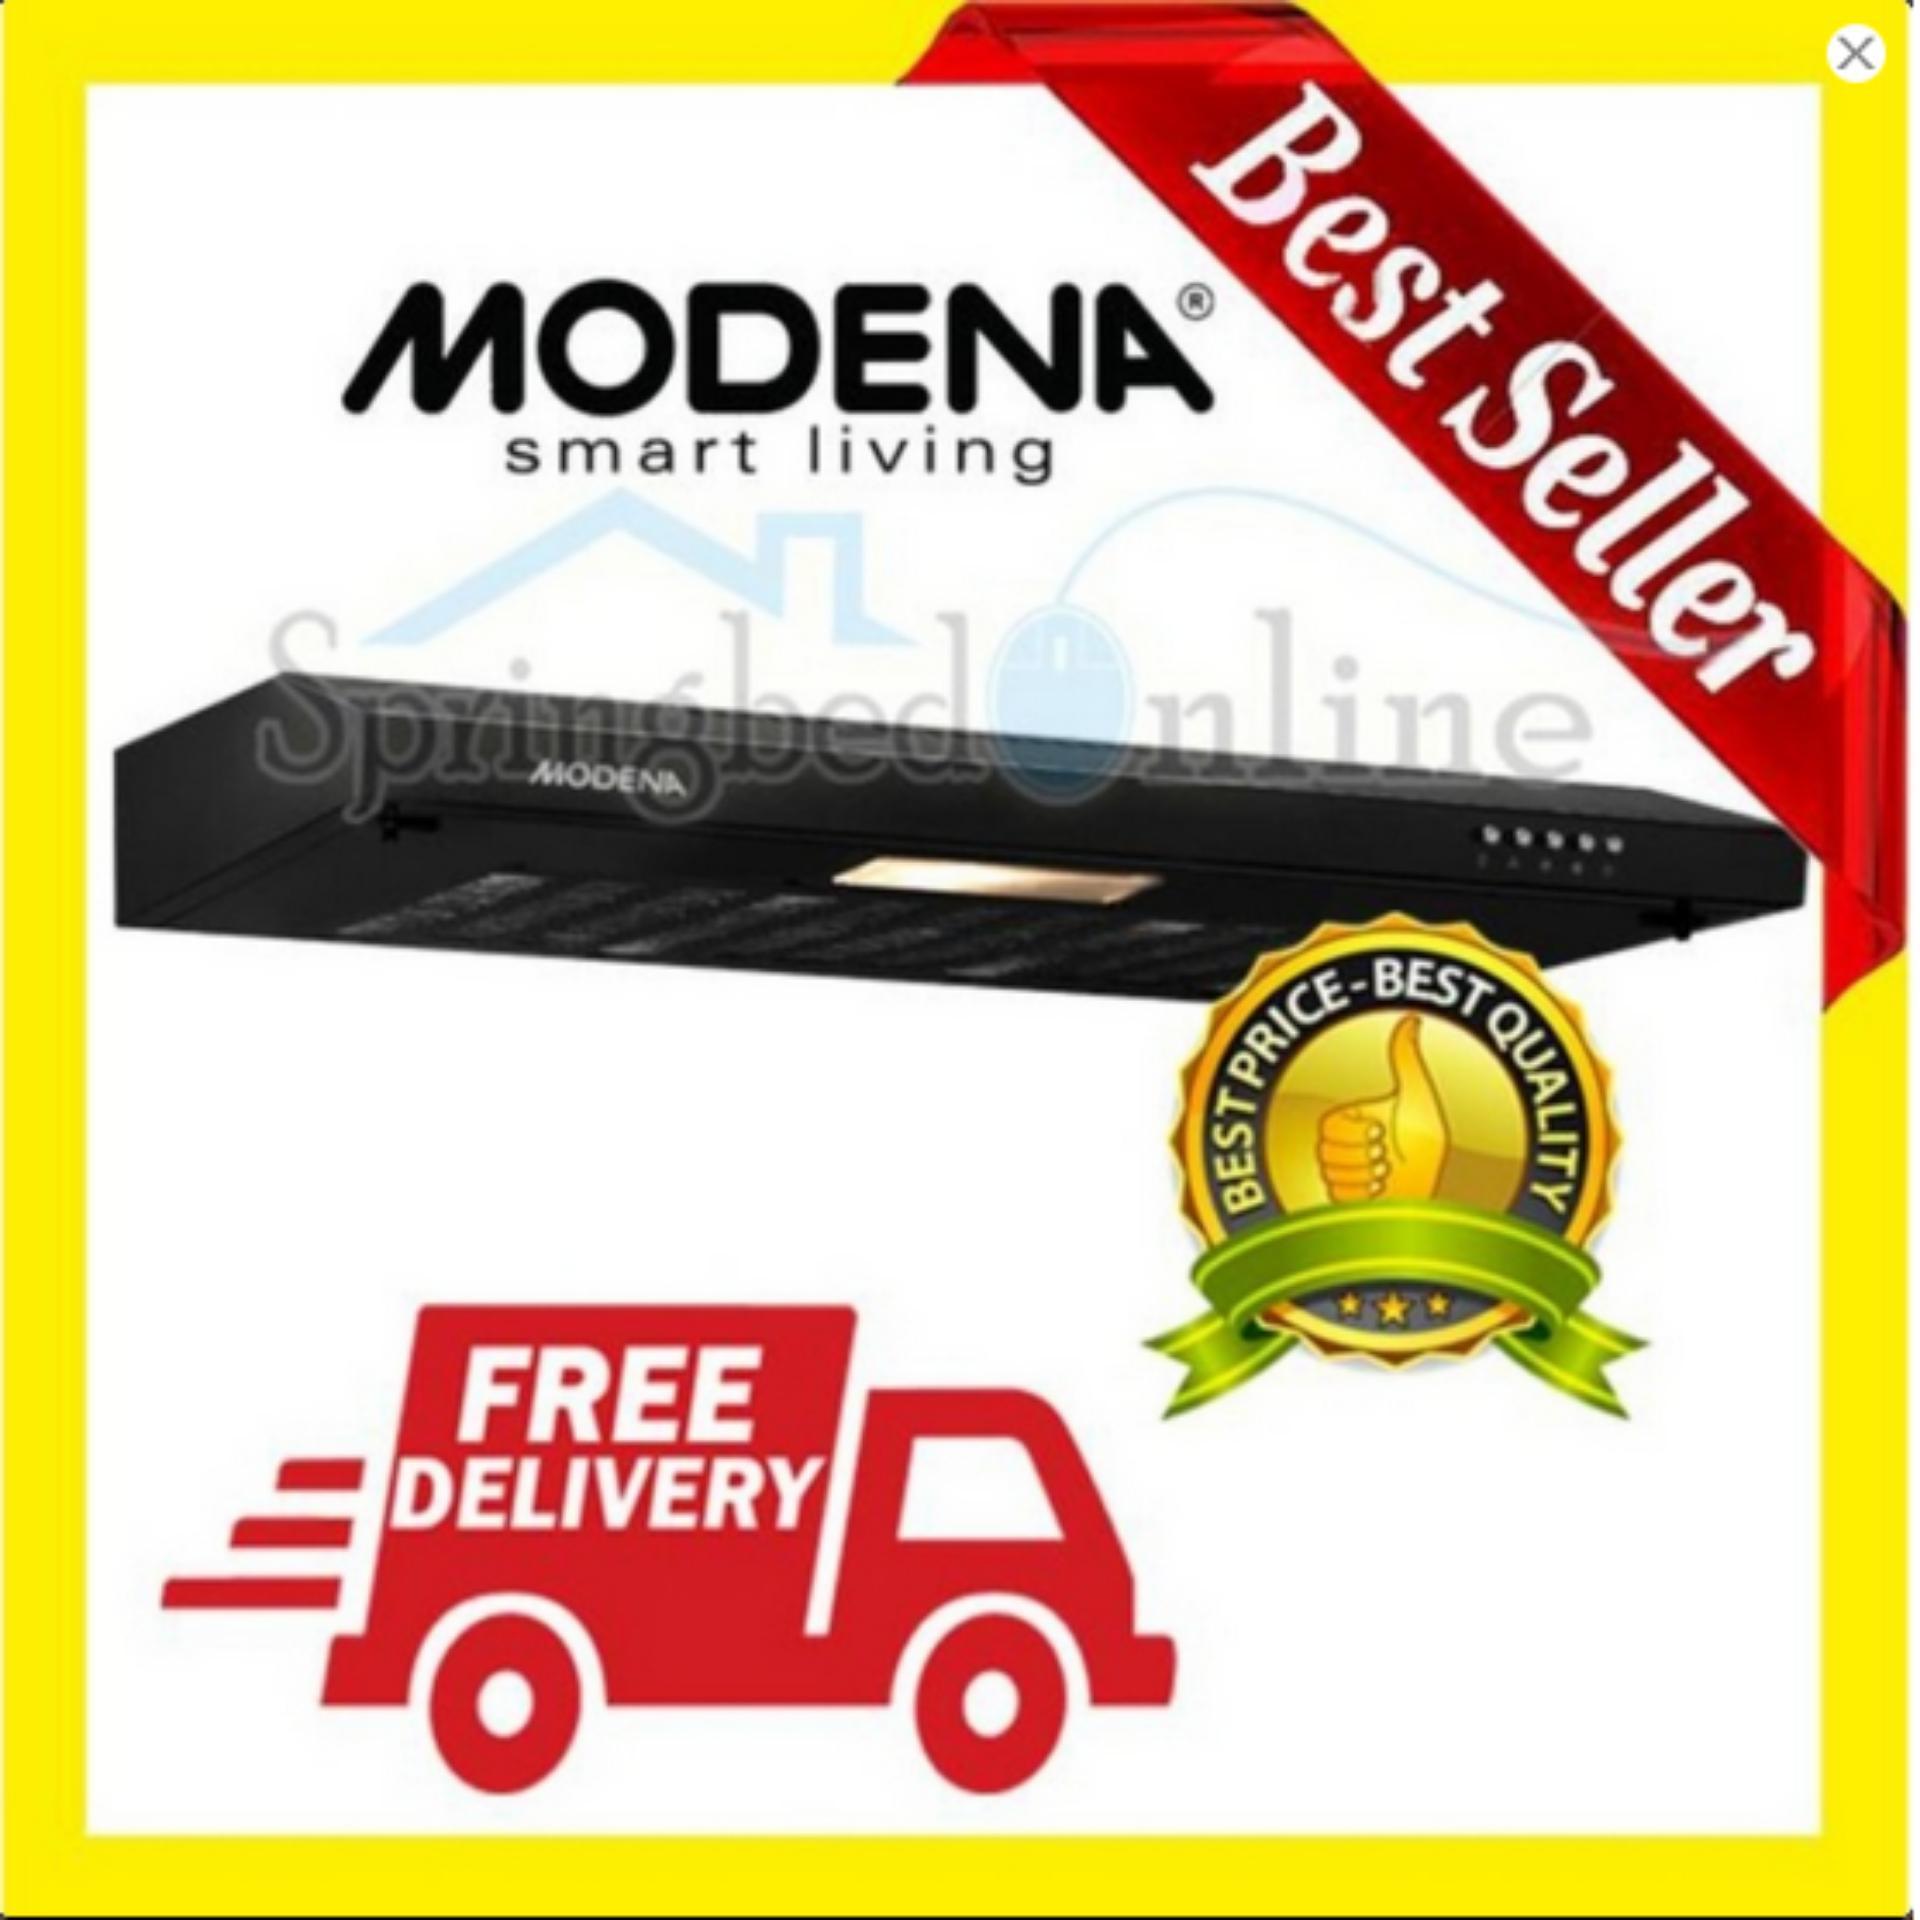 Flash Sale Paket Hemat Kompor Tanam Bh 1325 Dan Slim Cooker Hood Px Modena Built In Hob Gas 70 Cm 2 Tungku 1725  Pabrik 6001modena Harga